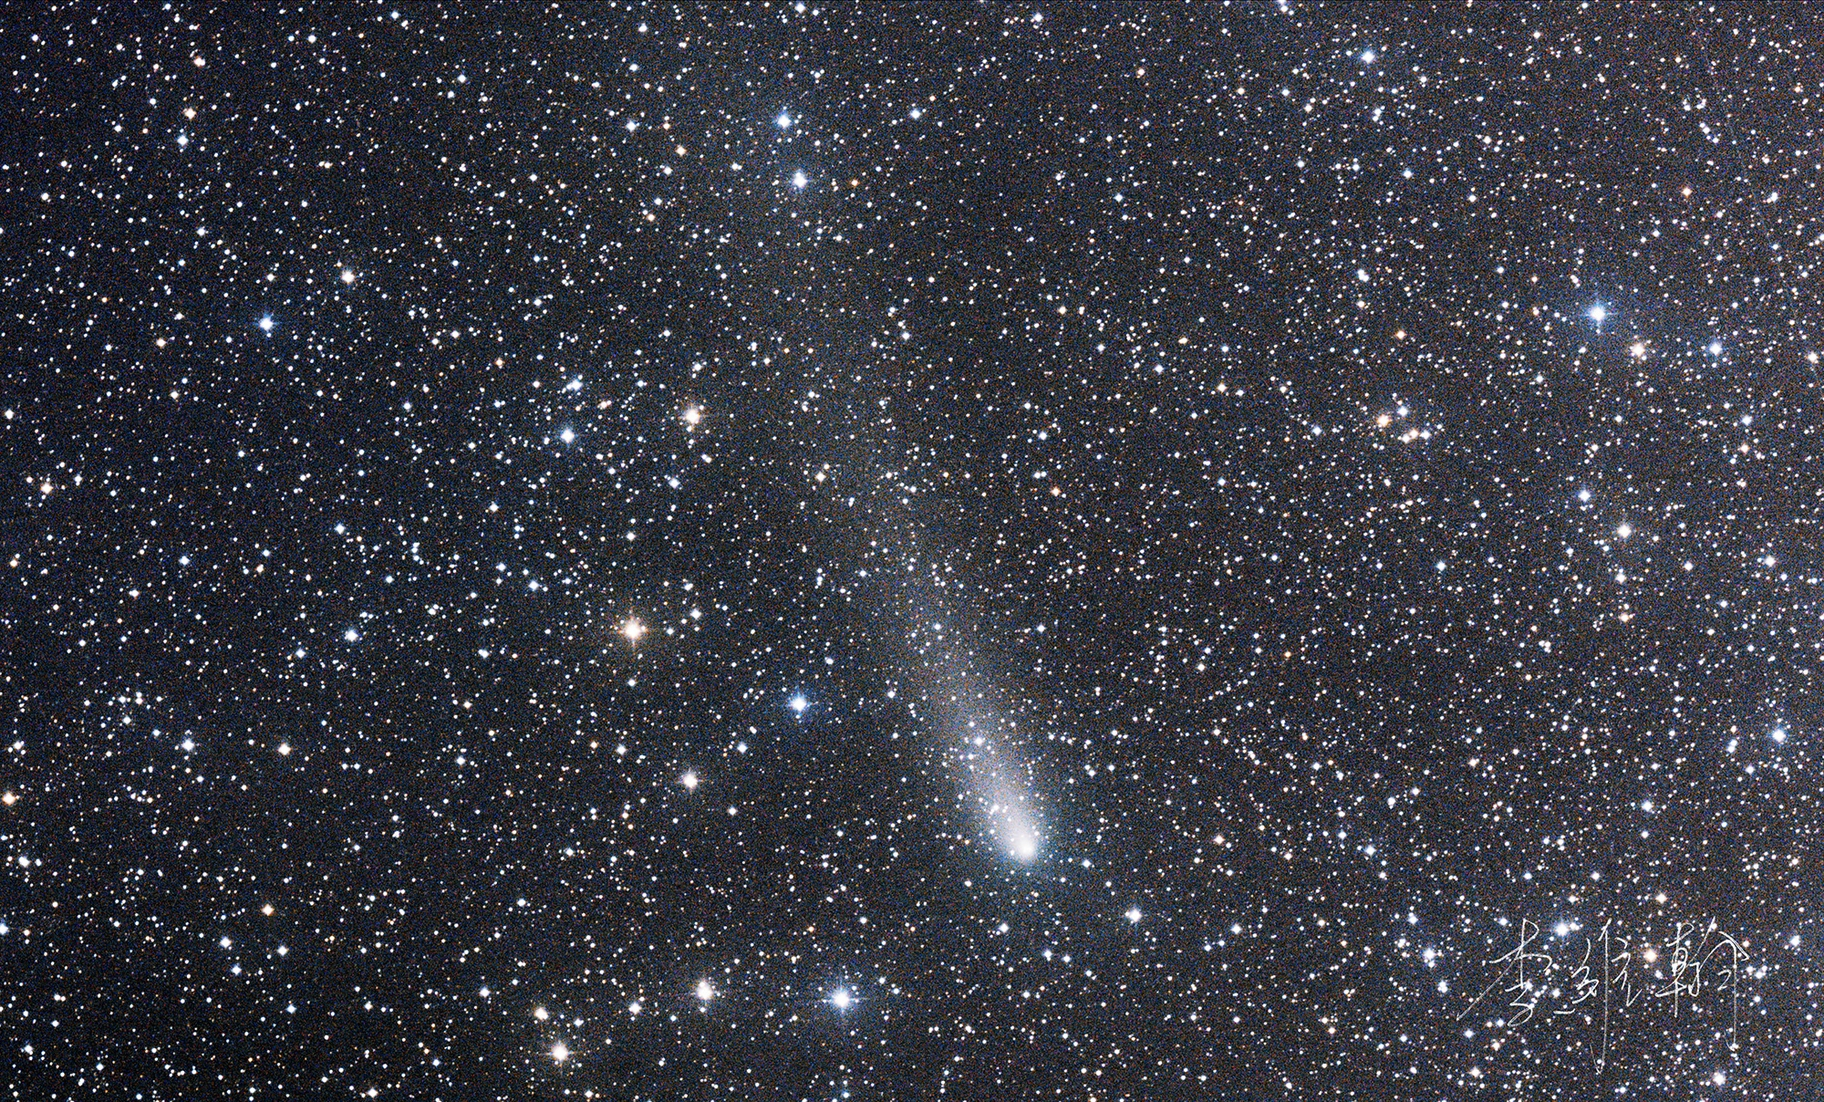 Comet 21P/Giacobini-Zinner,                                wei-hann-Lee